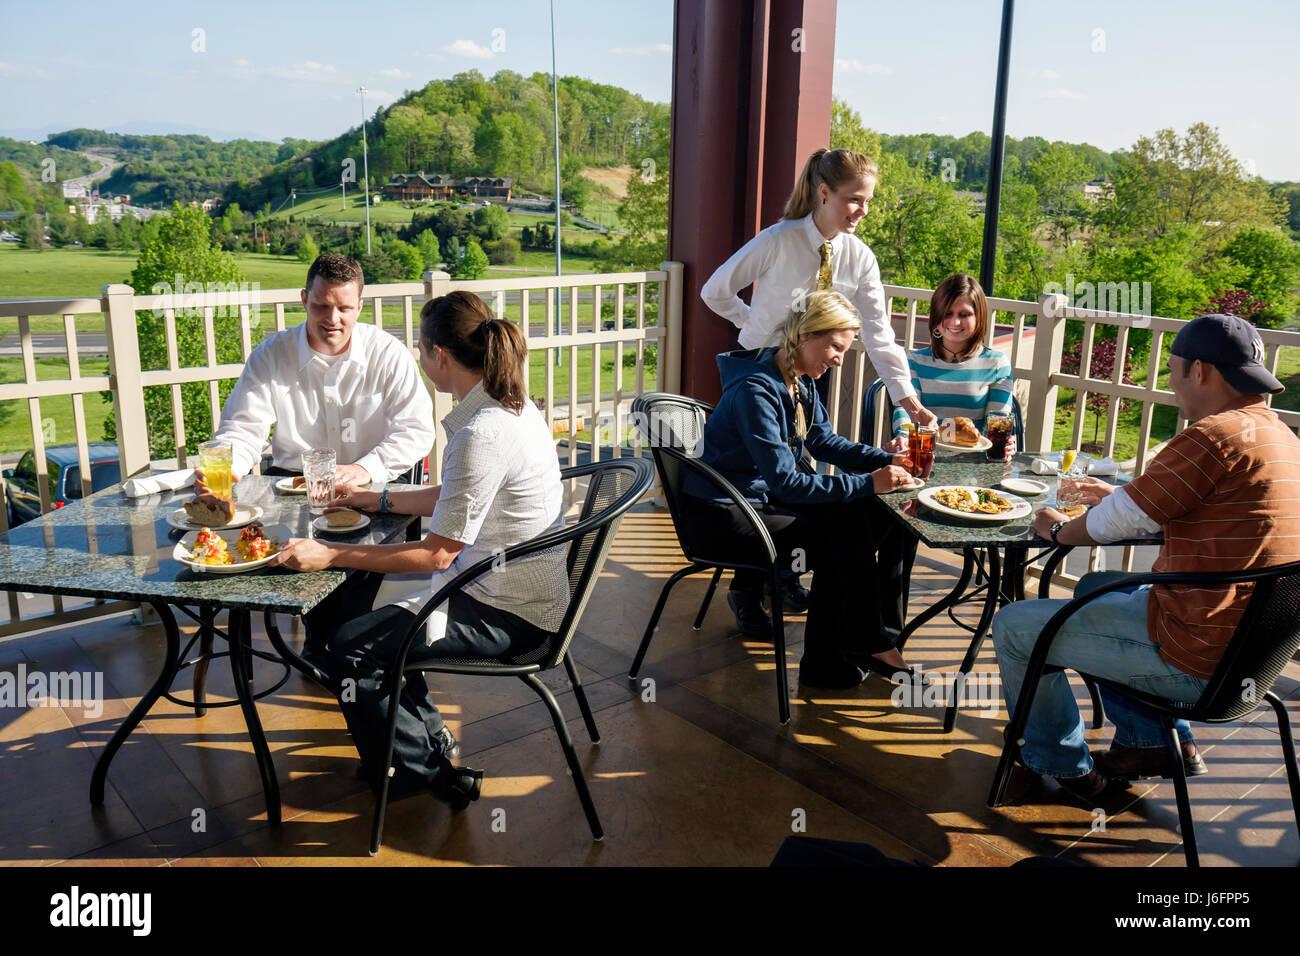 Tennessee Sevierville Kodak Chop House restaurant - Stock Image